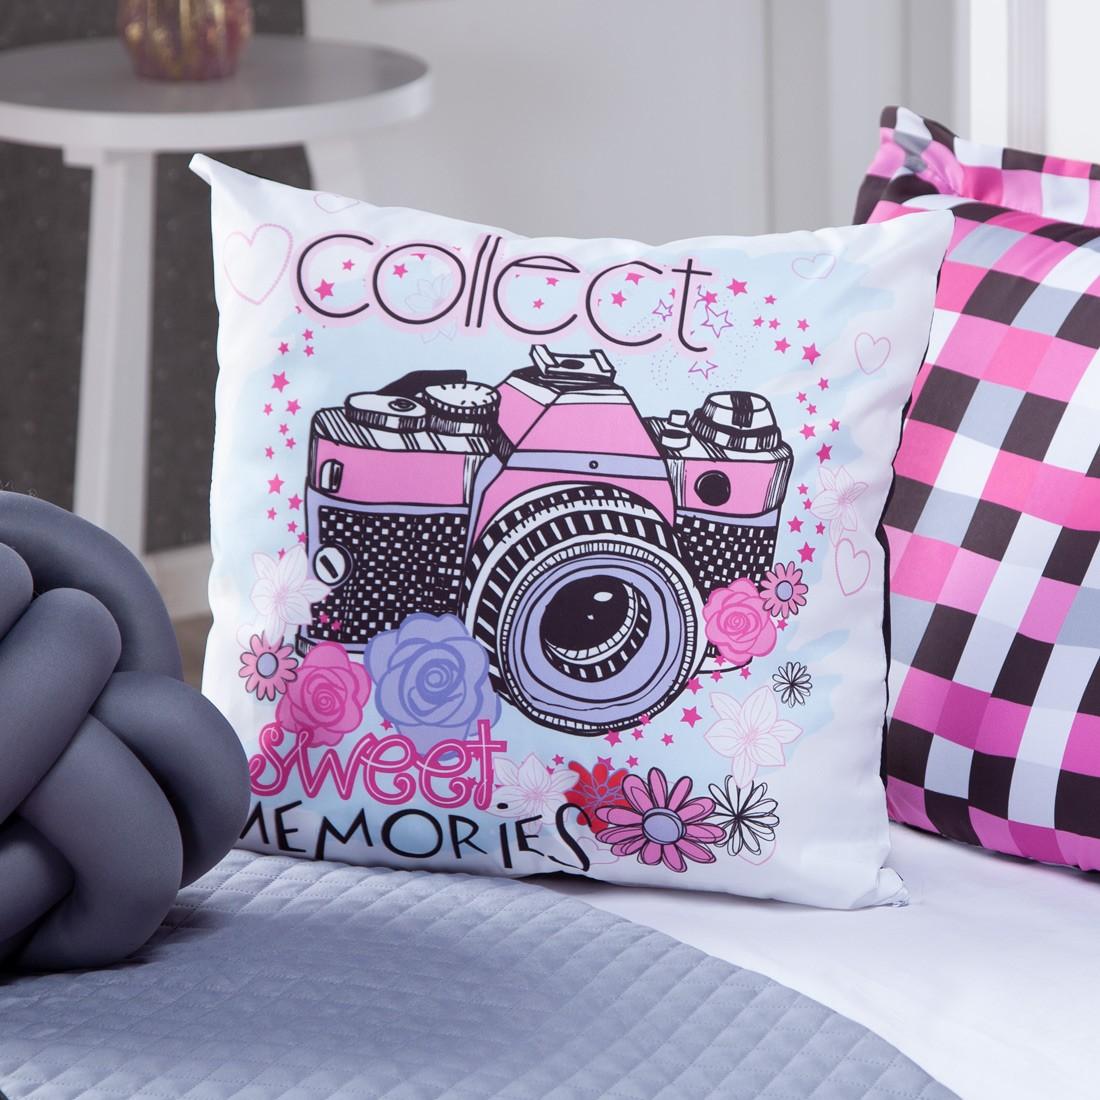 Kit Cobre Leito Memories Dupla Face c/ Almofadas Solteiro 05 Peças